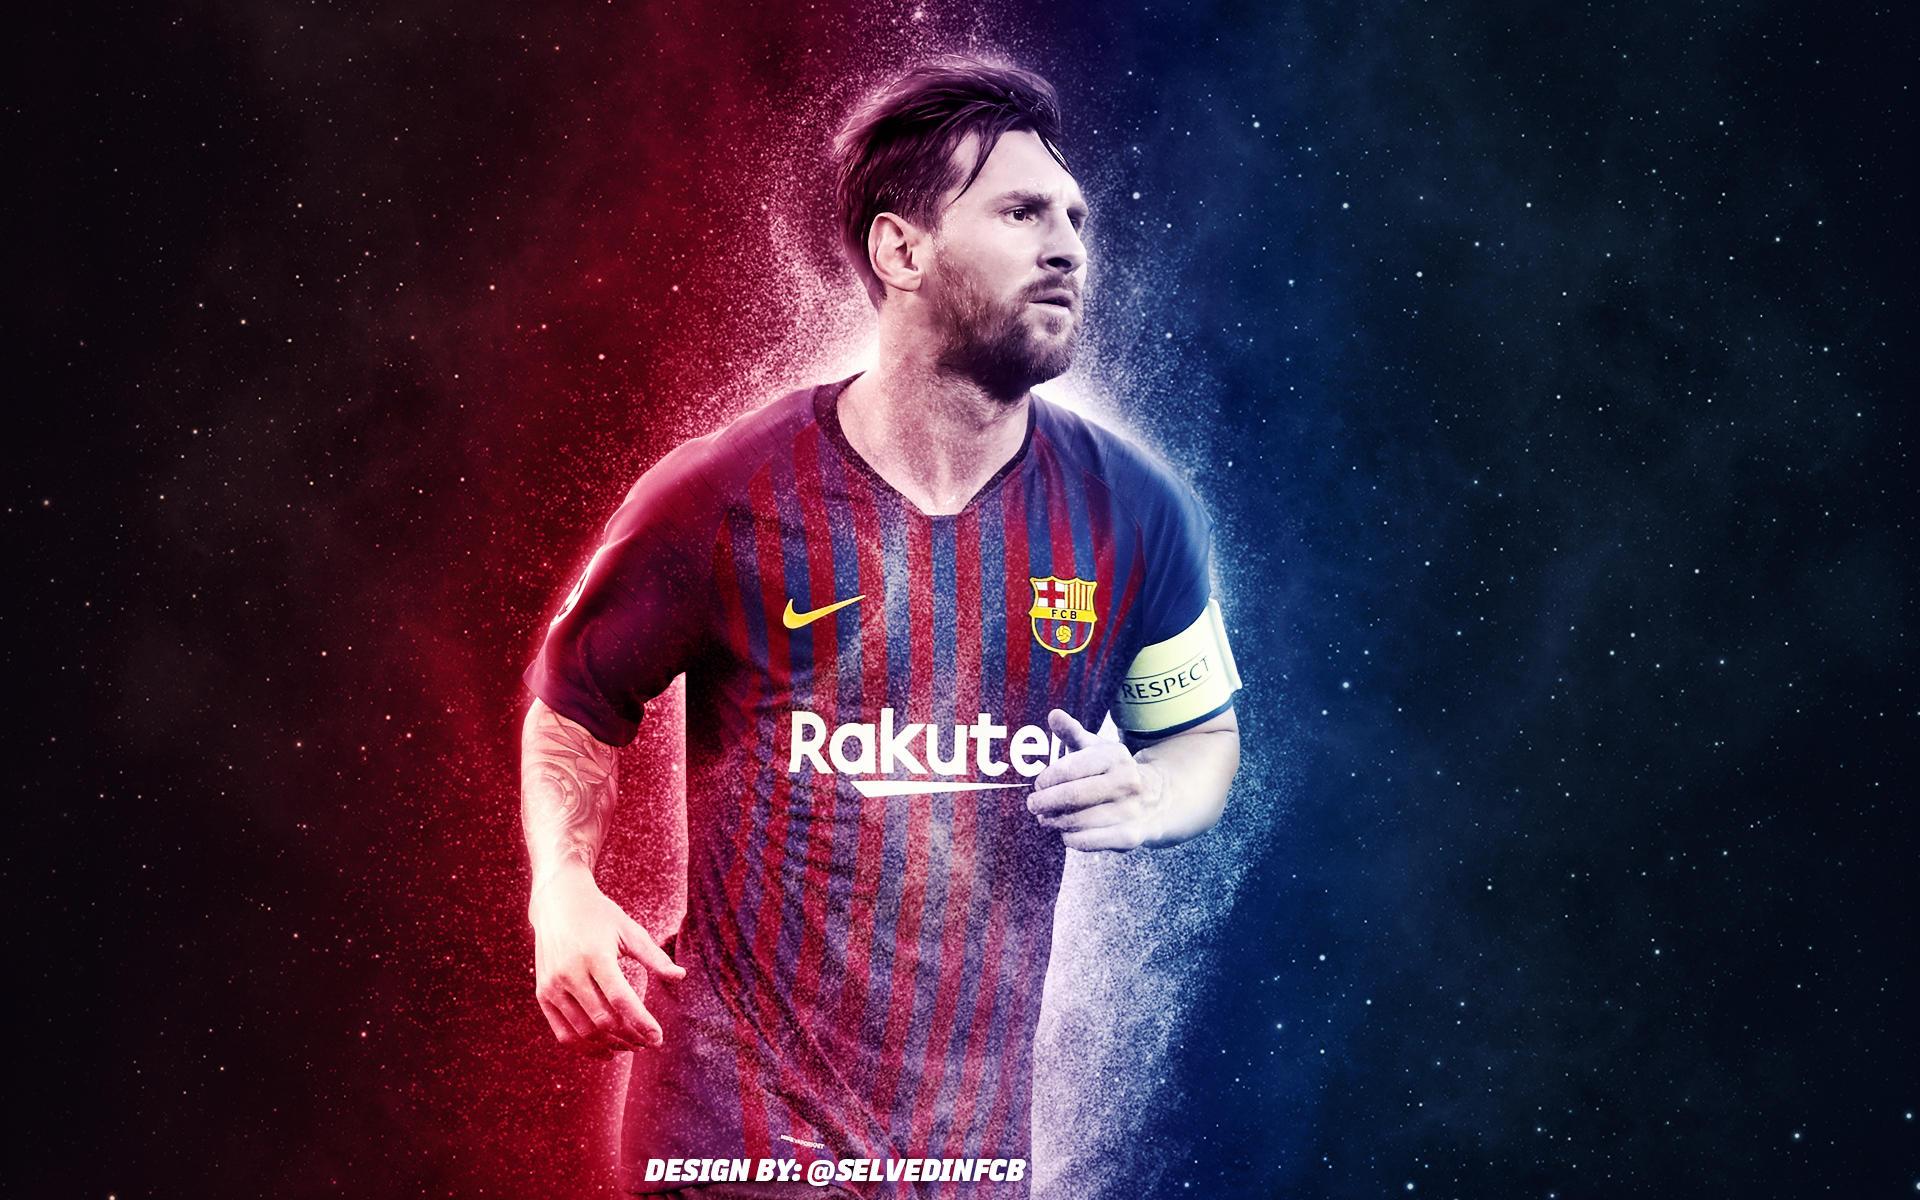 Lionel Messi Full Size Hd: Lionel Messi 2019 HD WALLPAPER By SelvedinFCB On DeviantArt